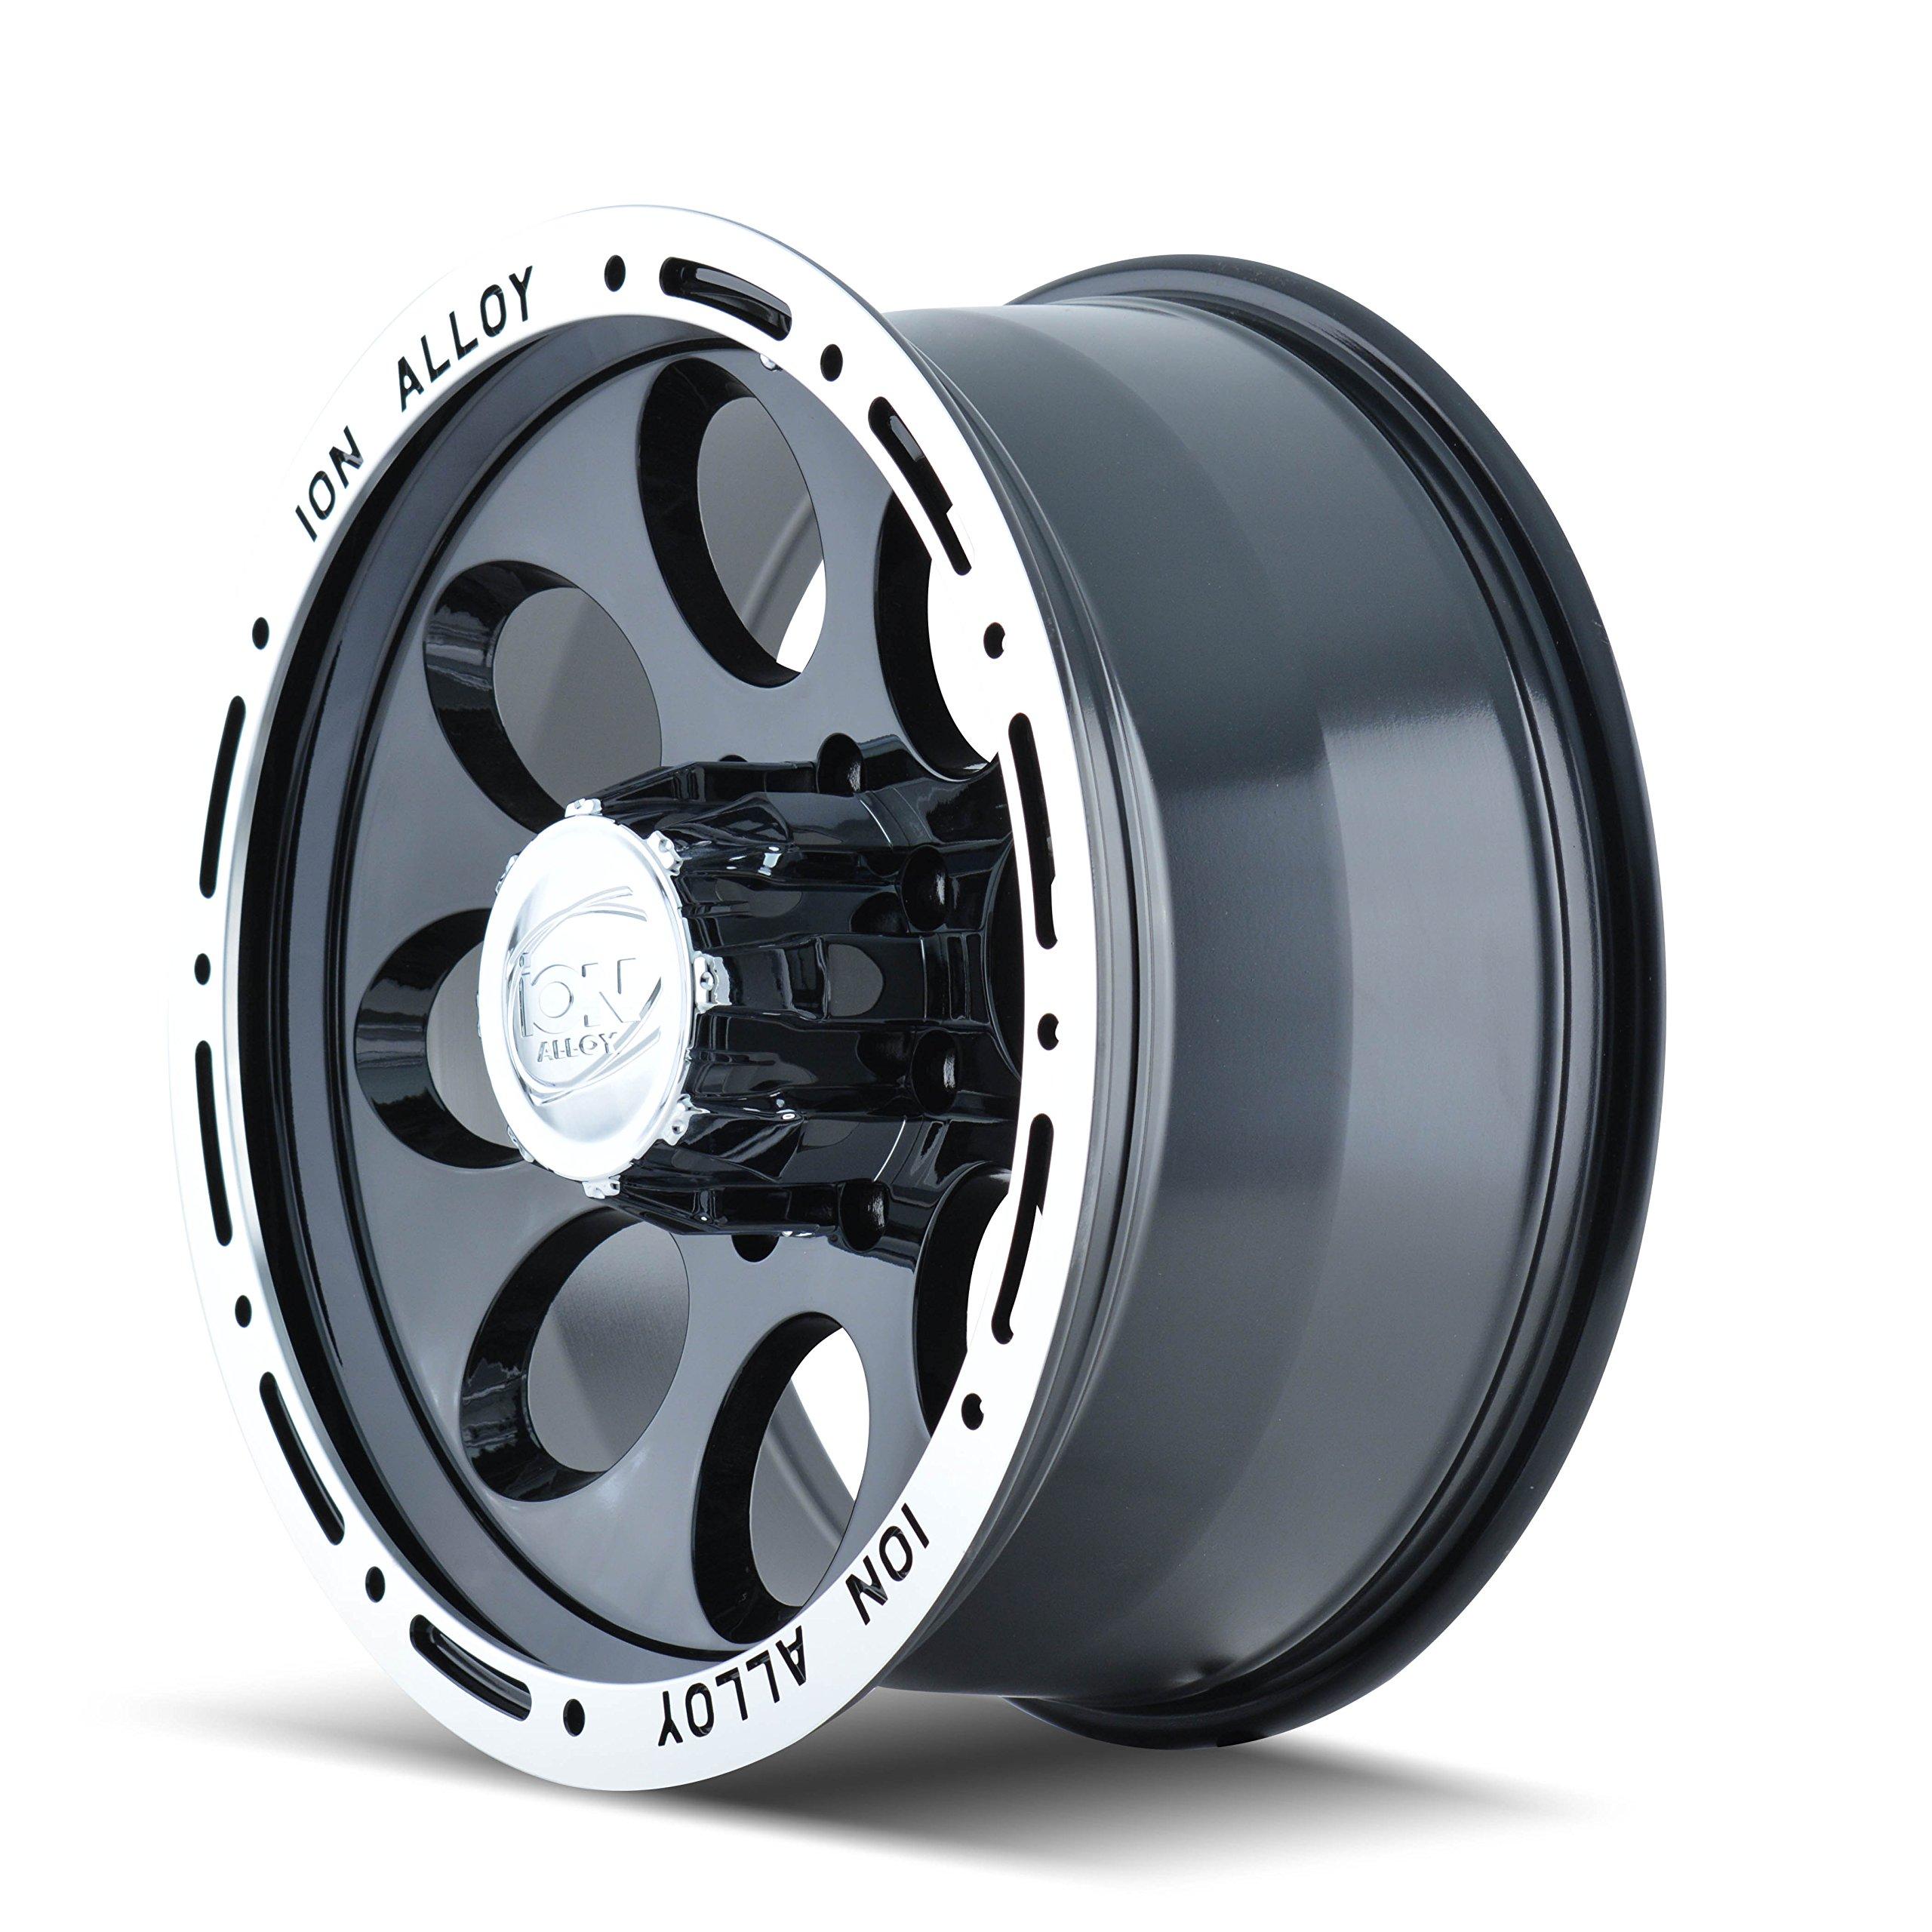 Ion Alloy 174 Black Beadlock Wheel (18x9''/6x139.7mm) by ION (Image #3)